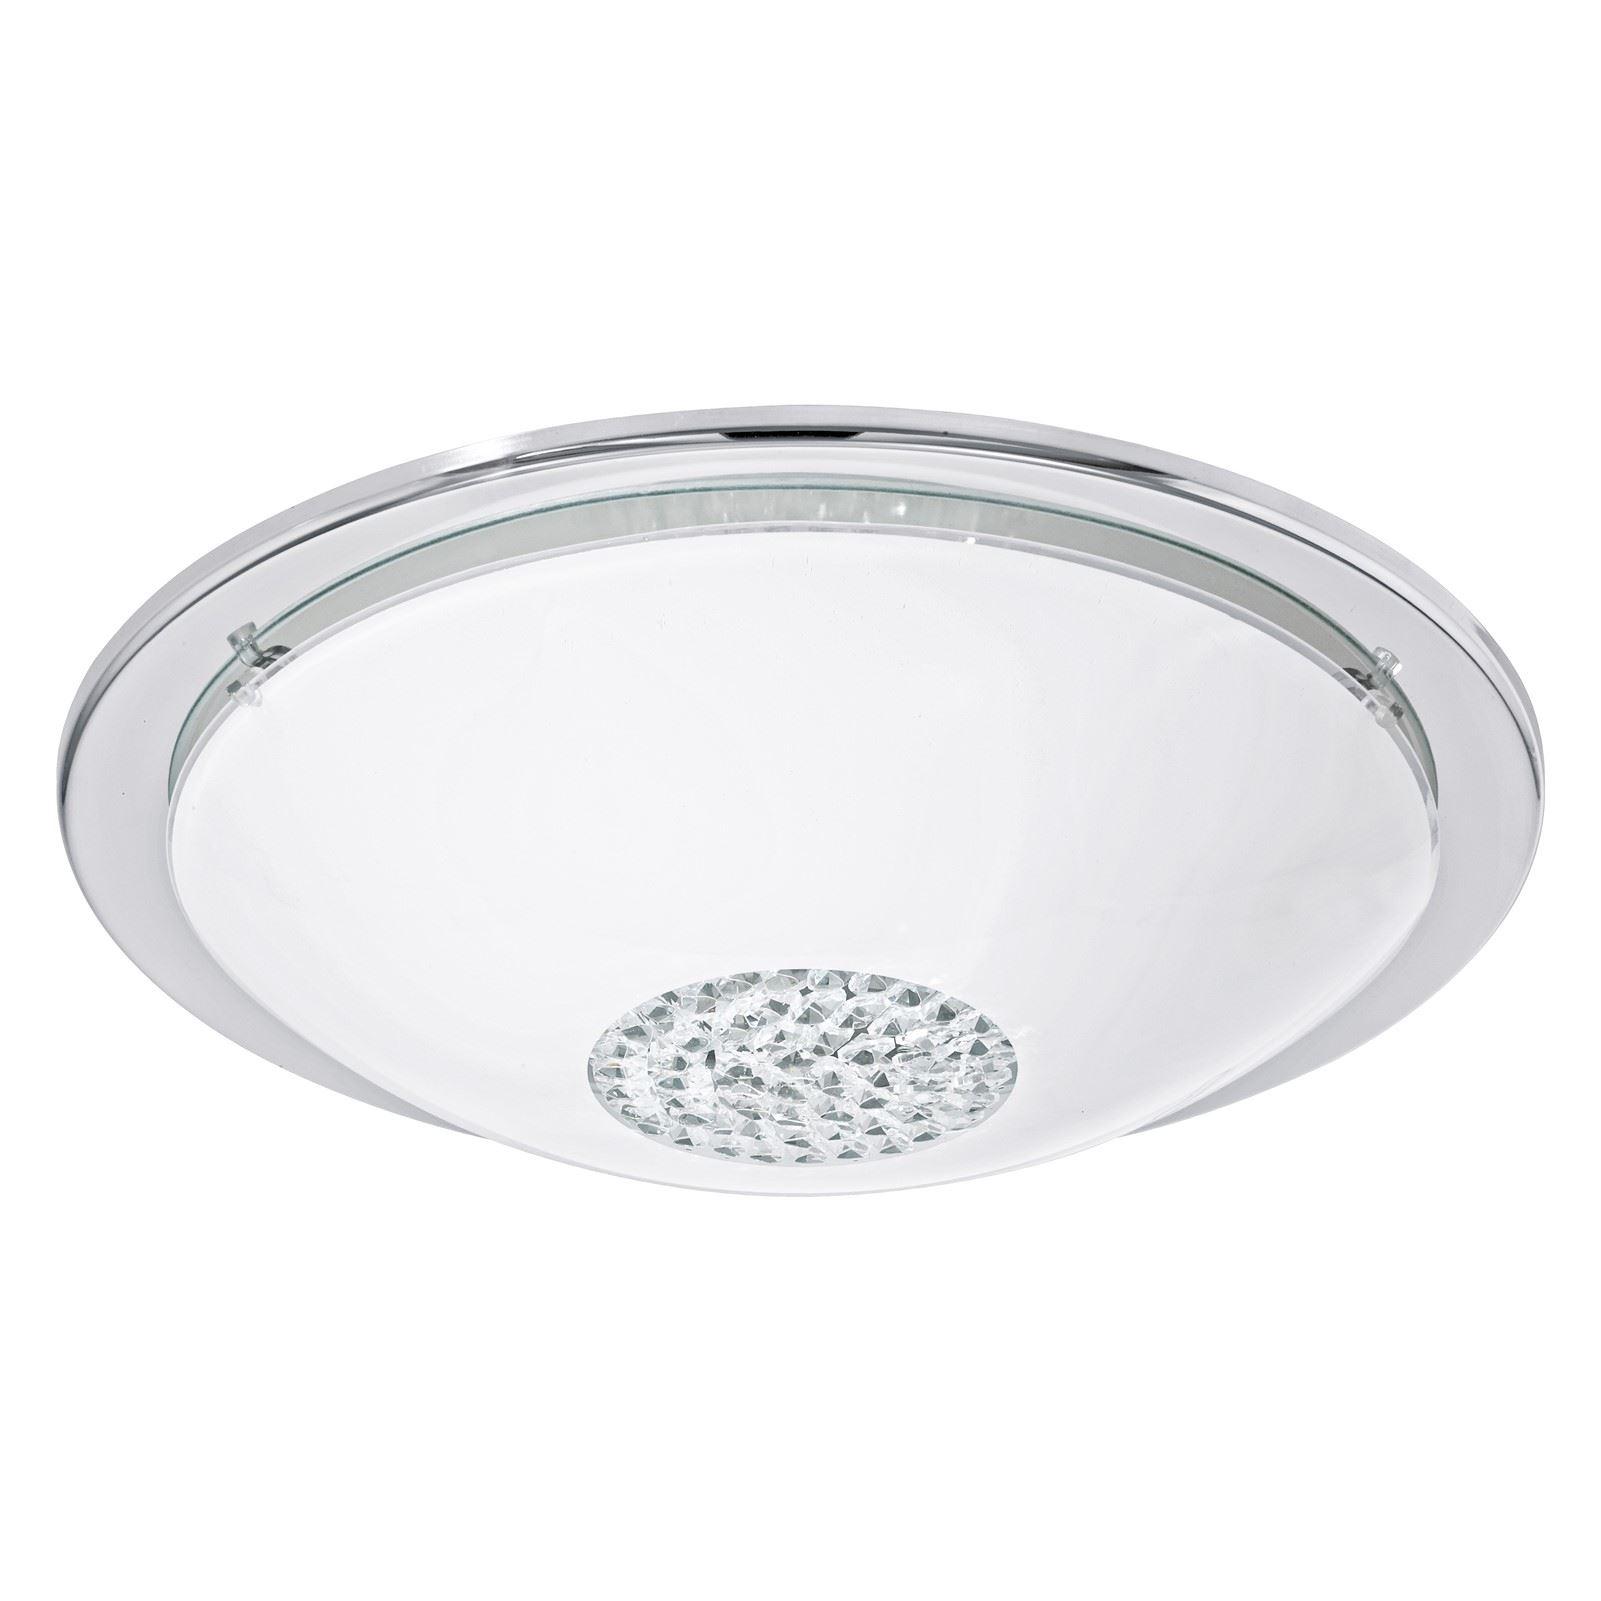 GIOLINA LED-Ceiling Light Chrome Clear White Shade Crystal